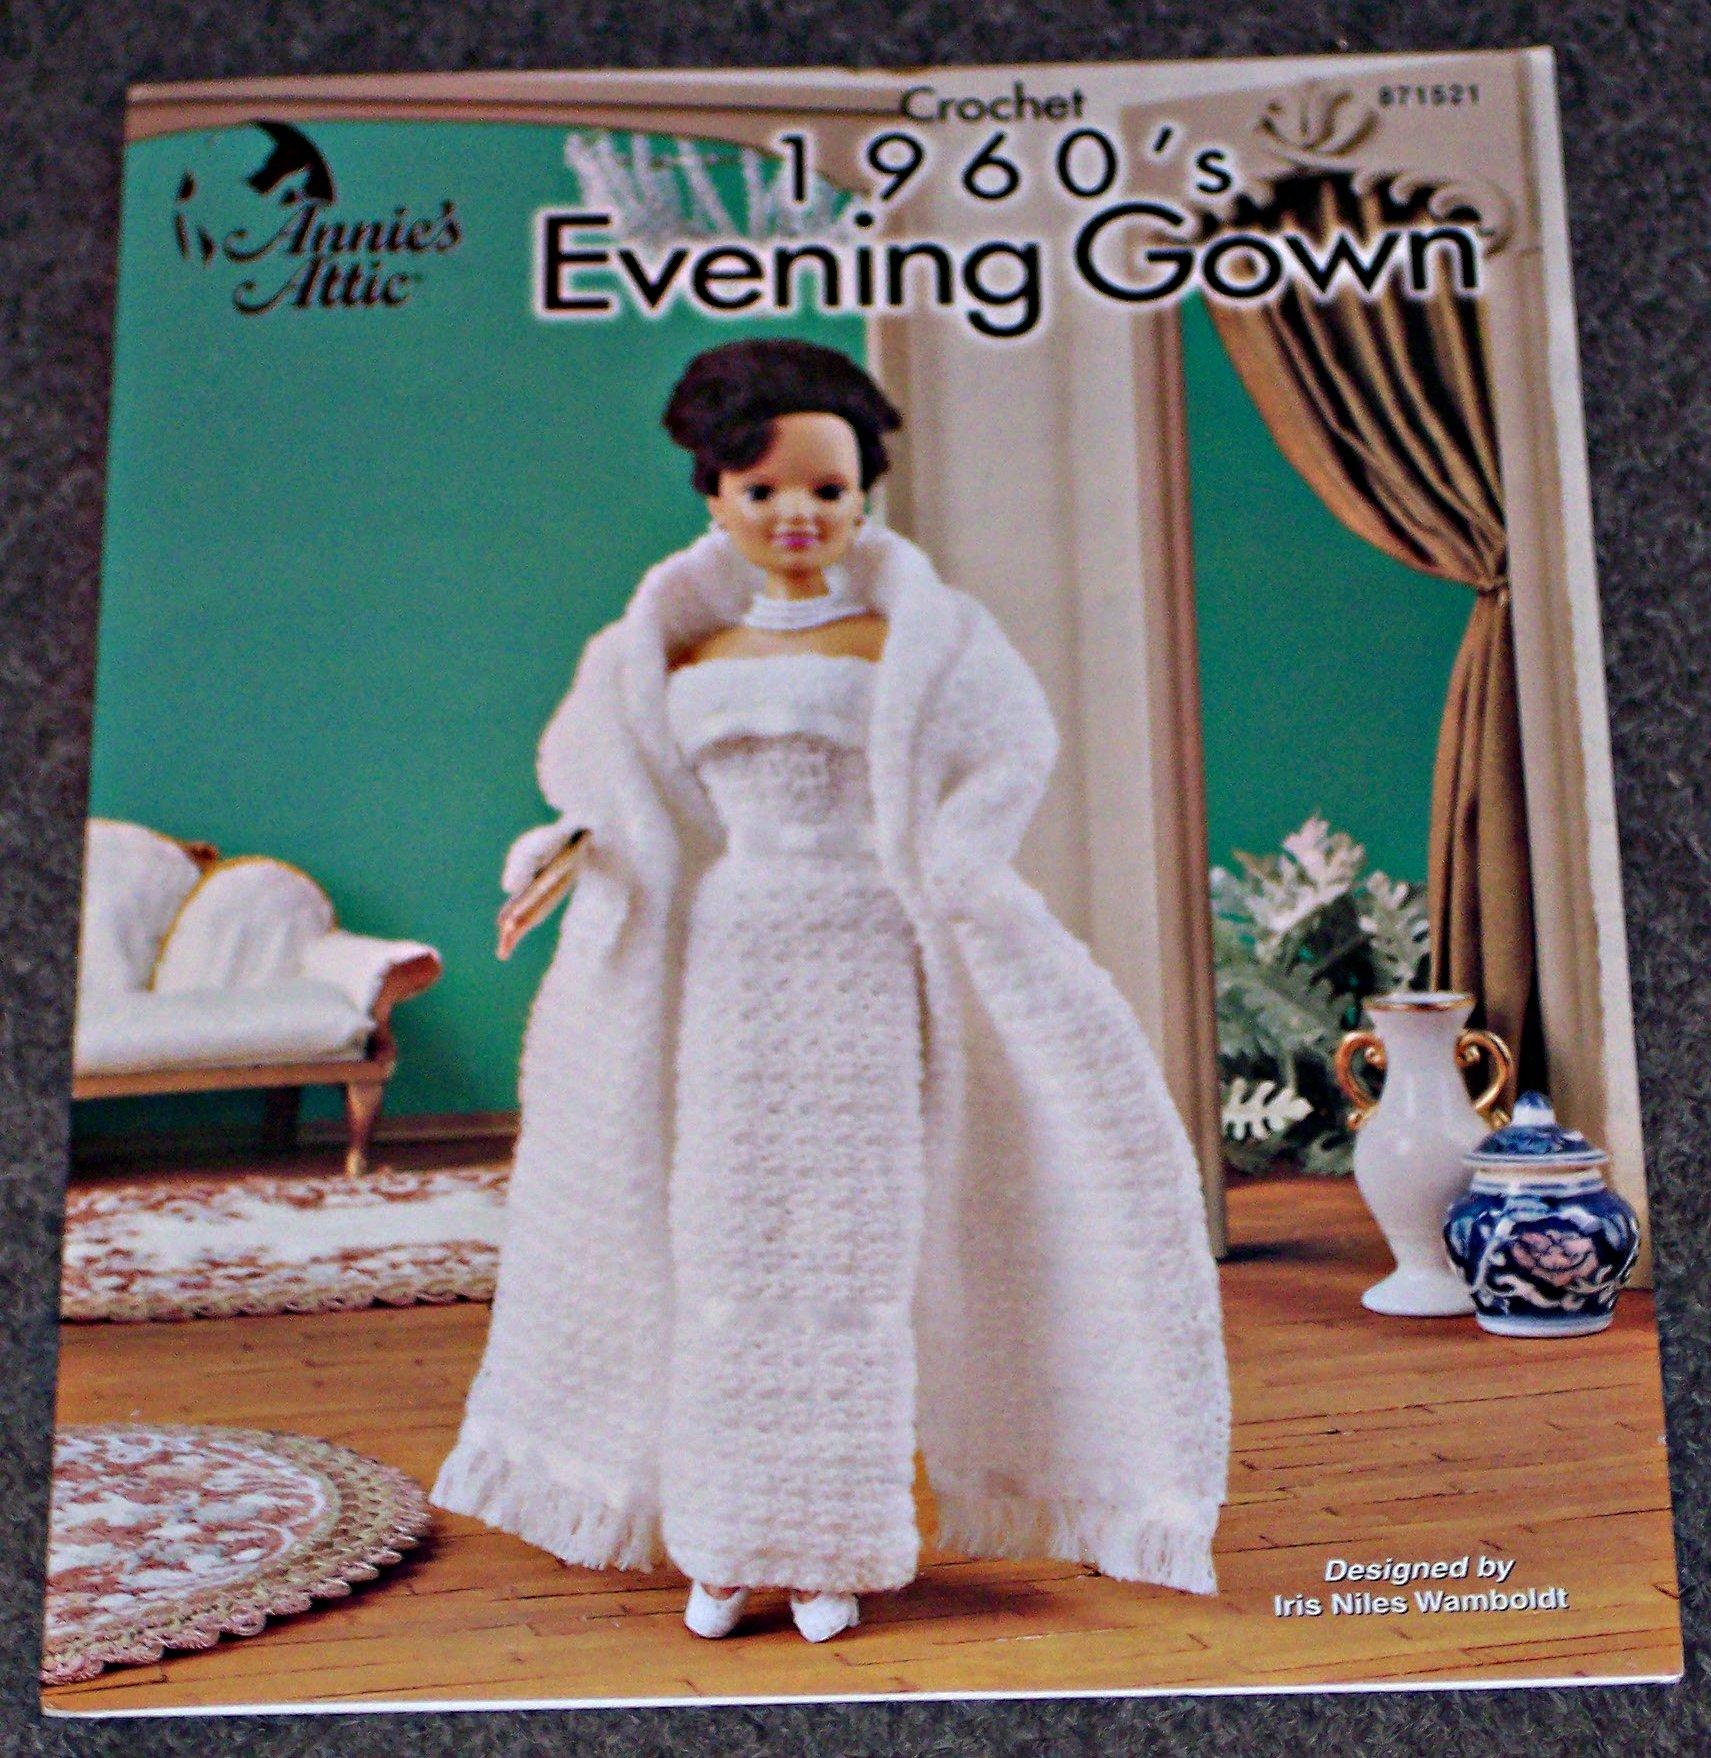 Crochet 1960\'s Evening Gown (871521) Designed by Iris Niles Wanboldt ...